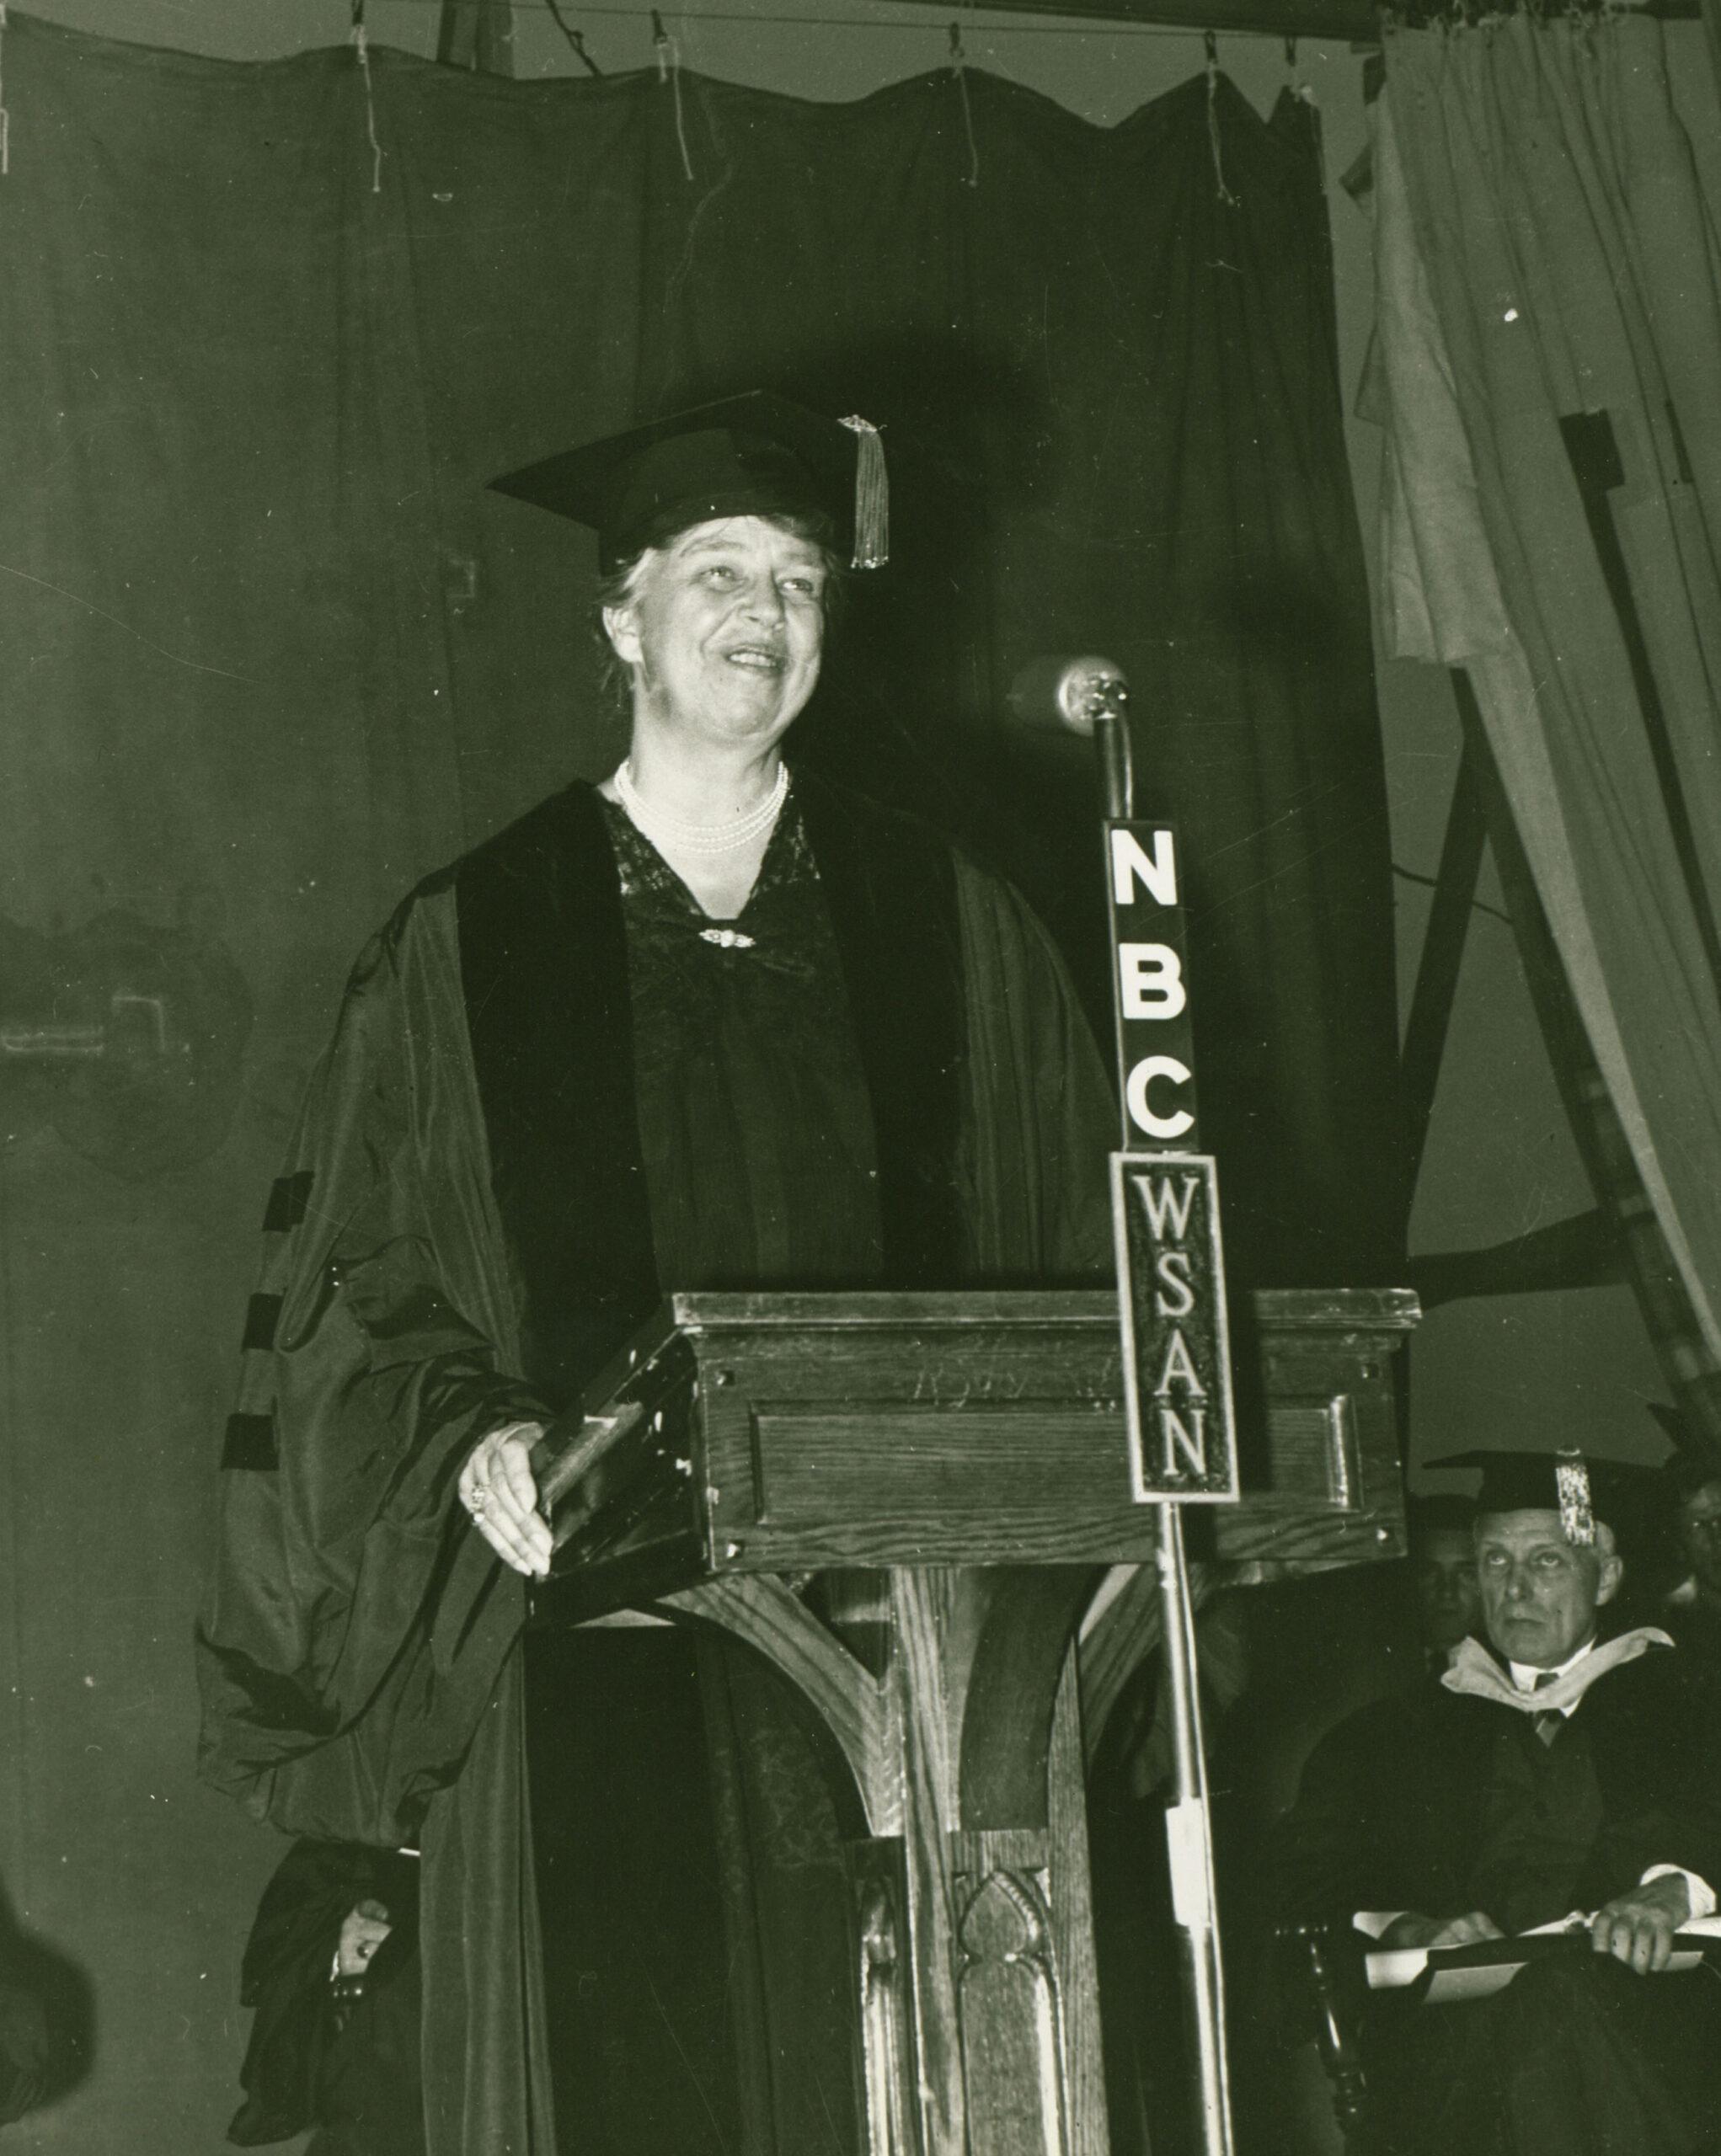 Eleanor Roosevelt makes a speech at Muhlenberg, 1942